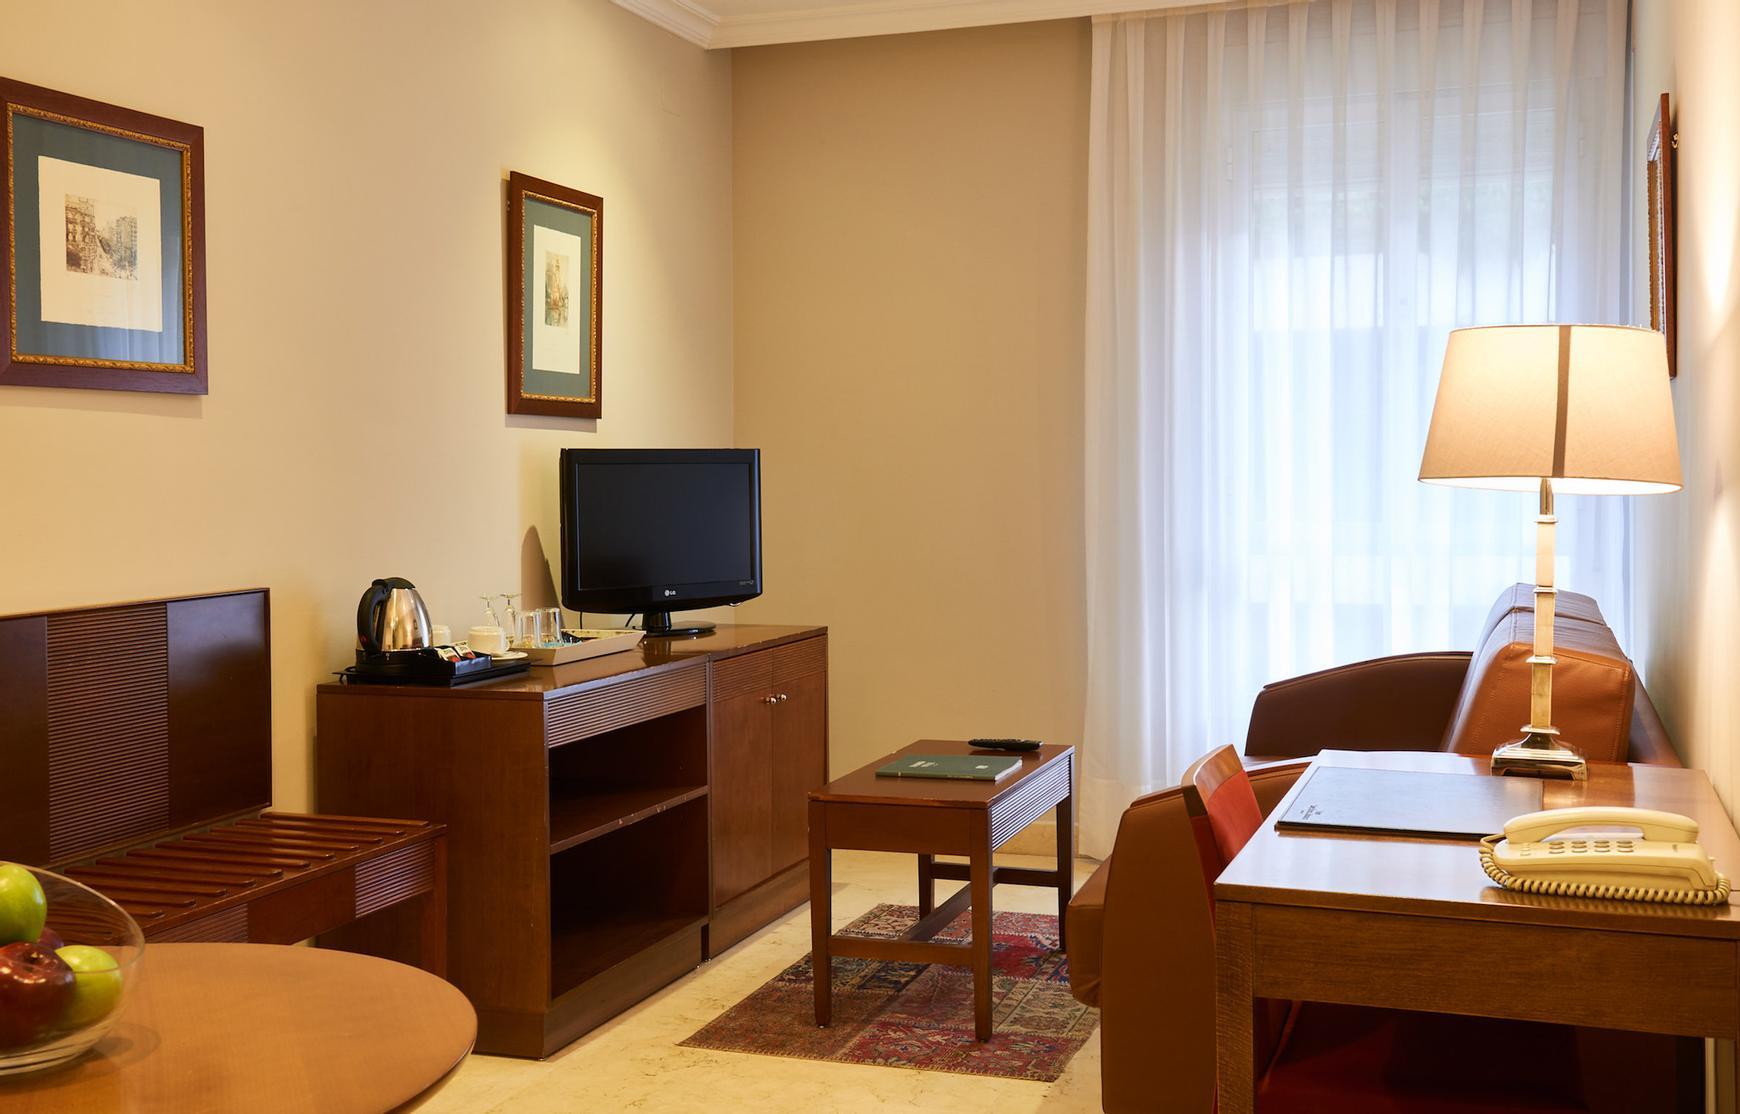 Suite triple hotel suites barrio de salamanca madrid for Codigo postal del barrio de salamanca en madrid